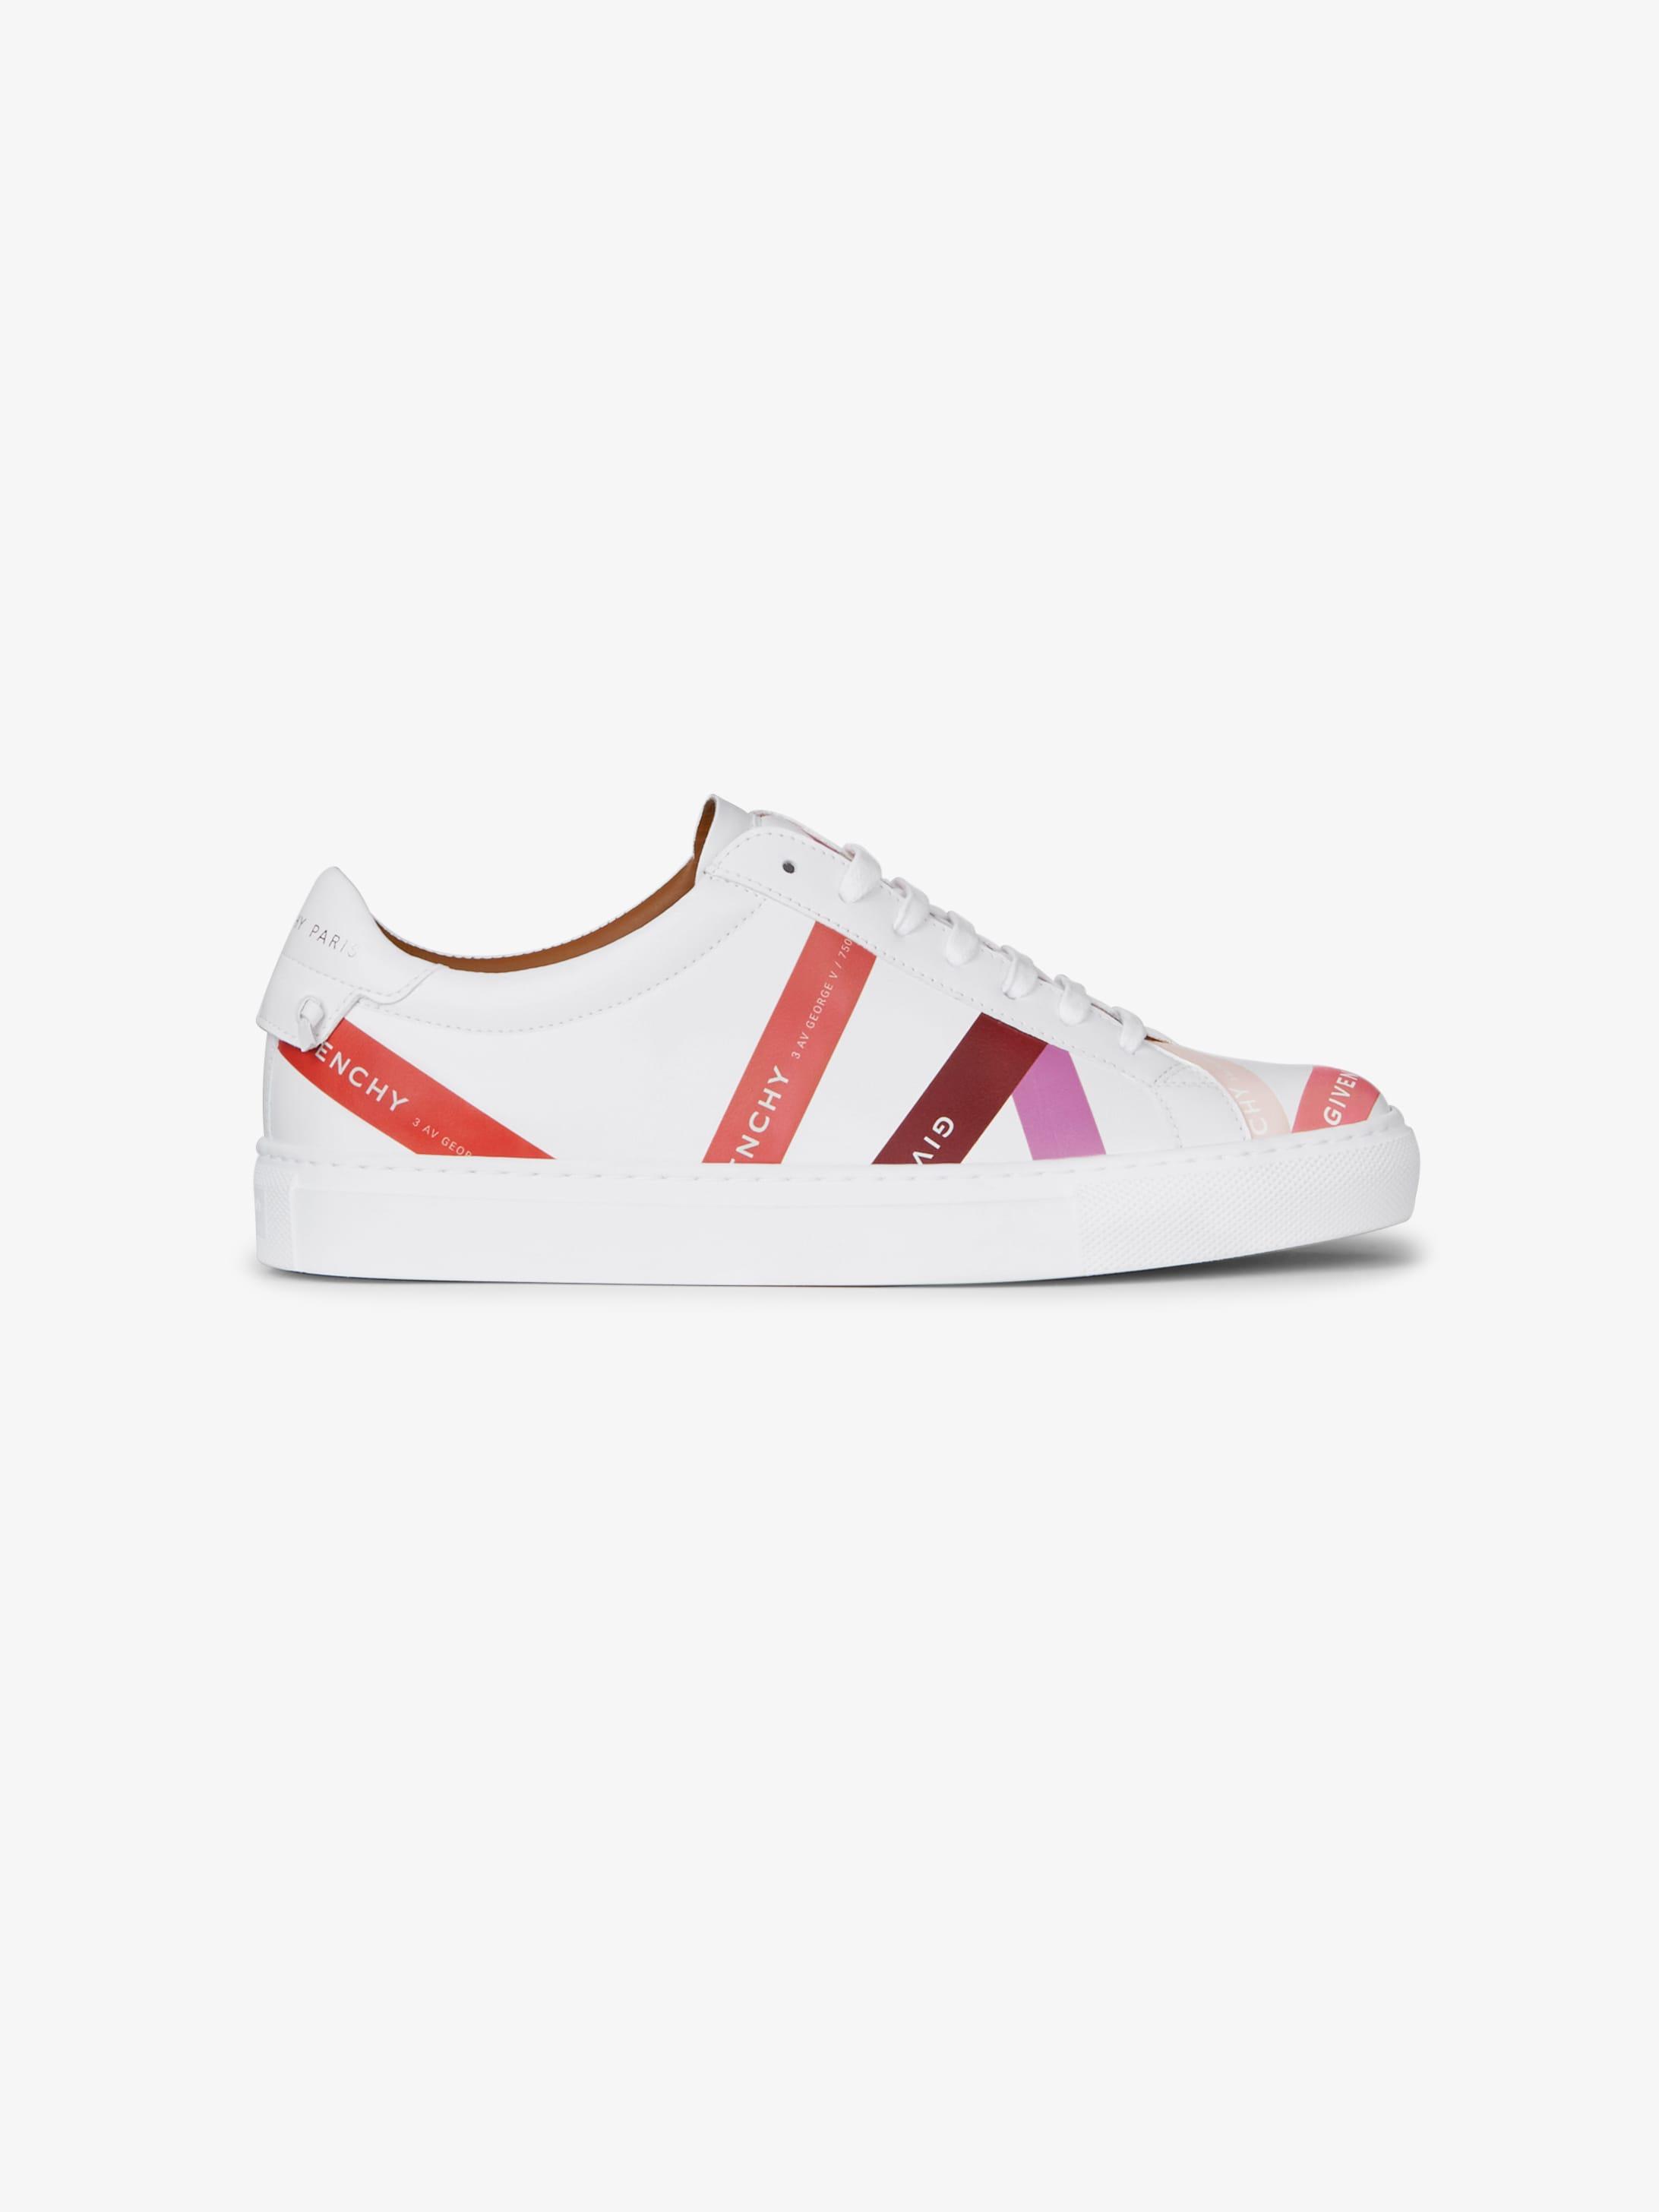 Sneakers en cuir à bandes GIVENCHY multicolores